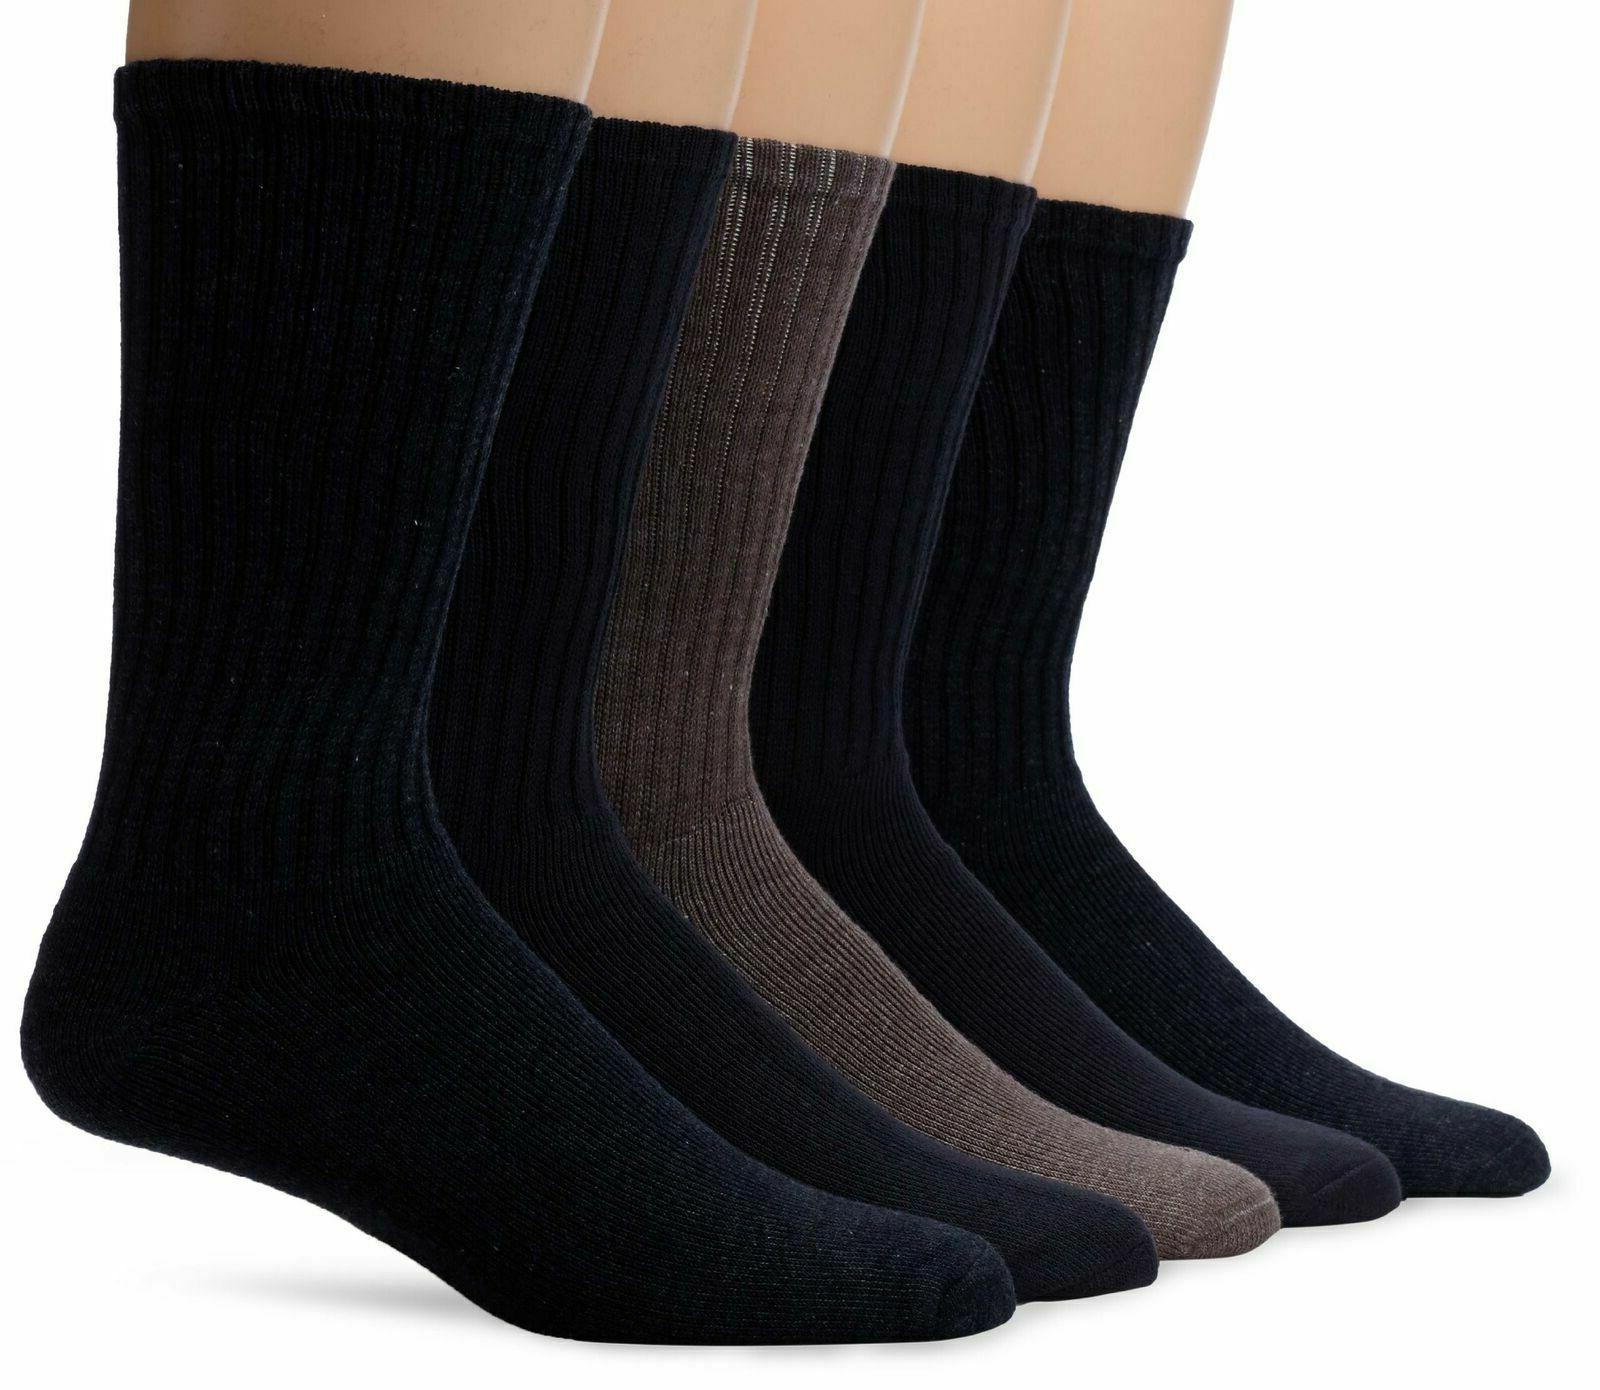 Dockers Men's 5 Pack Cushion Comfort Sport Crew Socks Navy/C